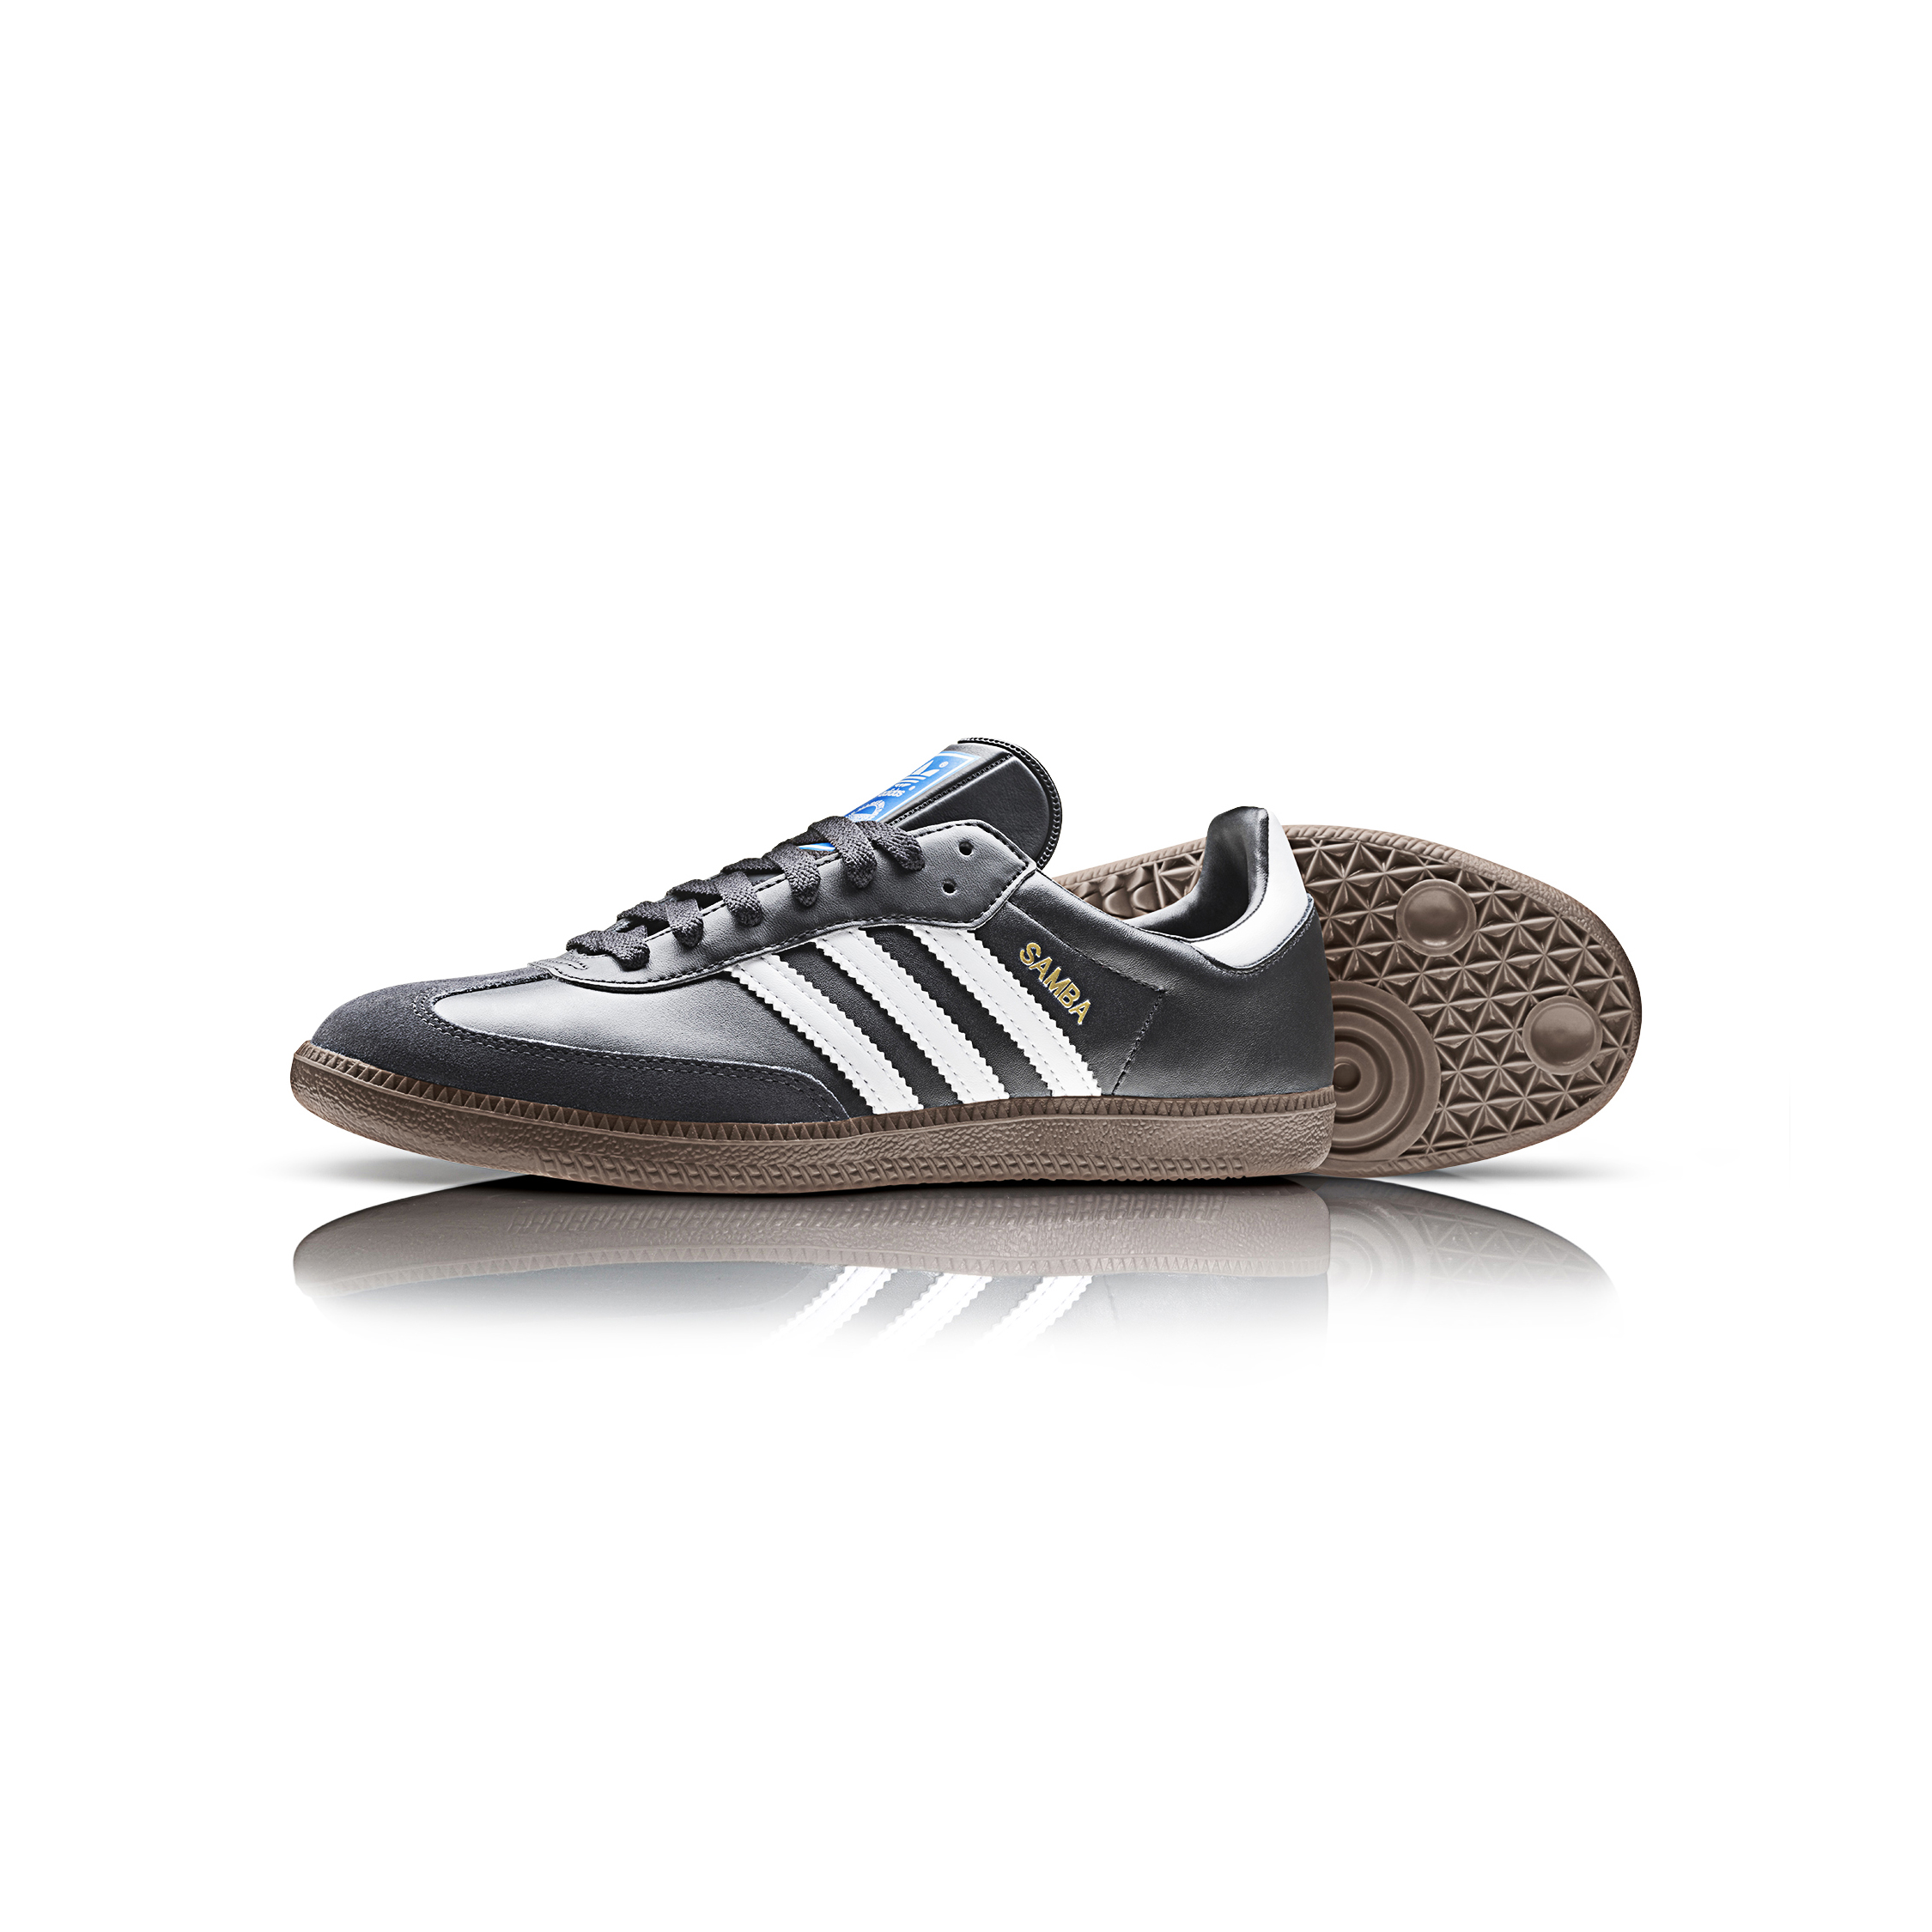 Adidas_Iconics_G17100.jpg